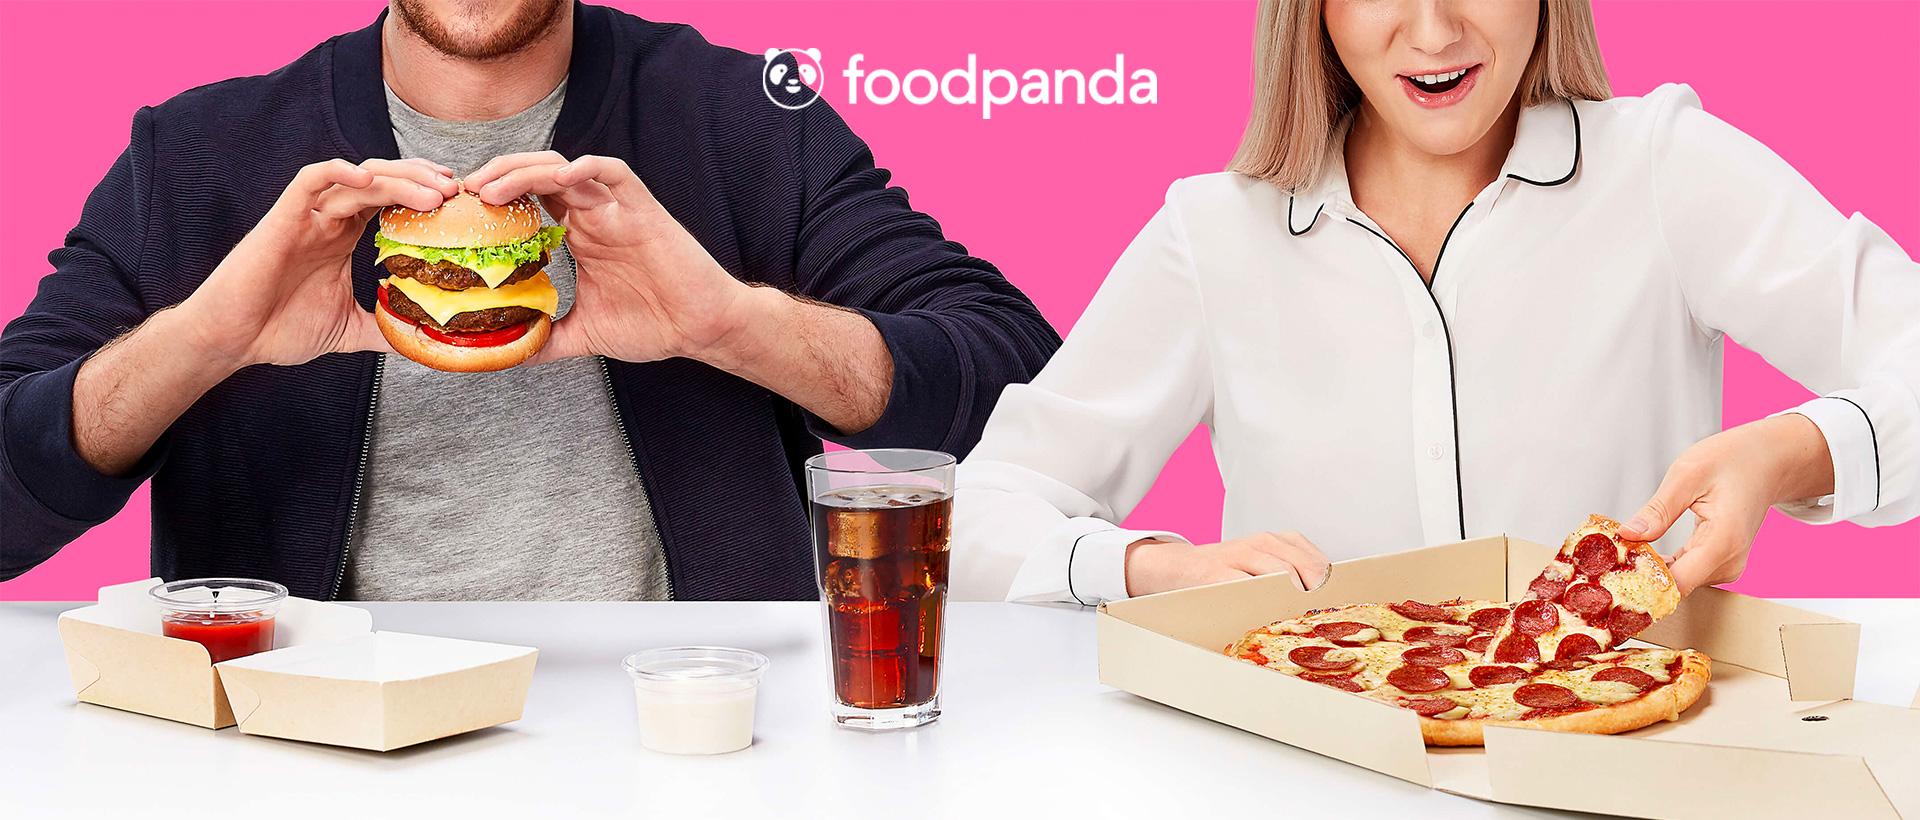 foodpanda 24 hours